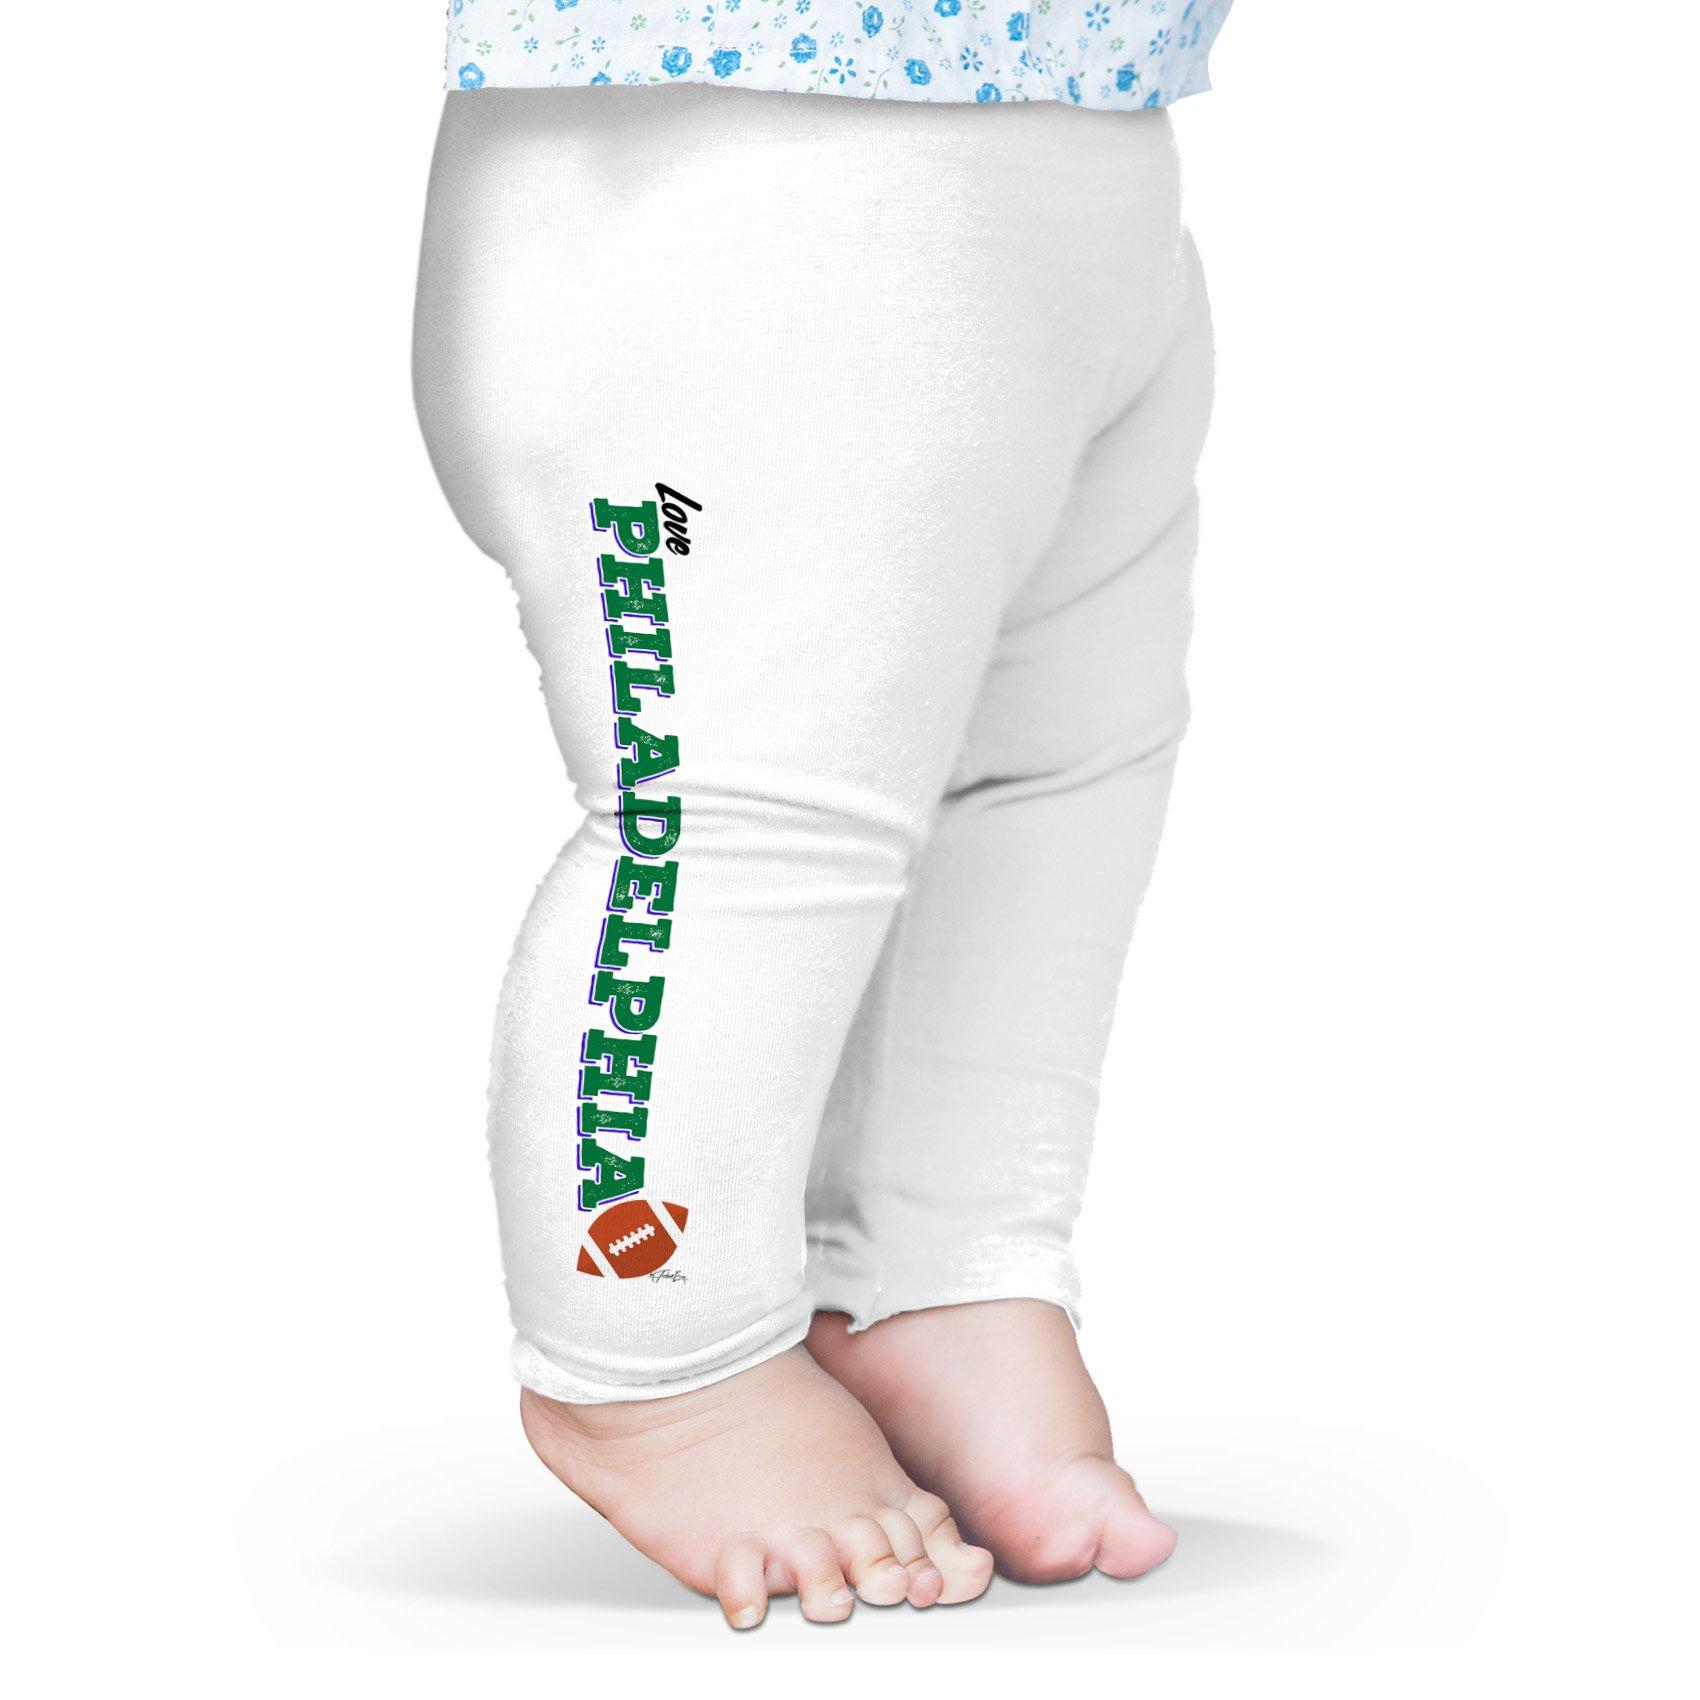 Twisted Envy Baby I Love Philadelphia American Football Leggings Trousers 3-6 Months White